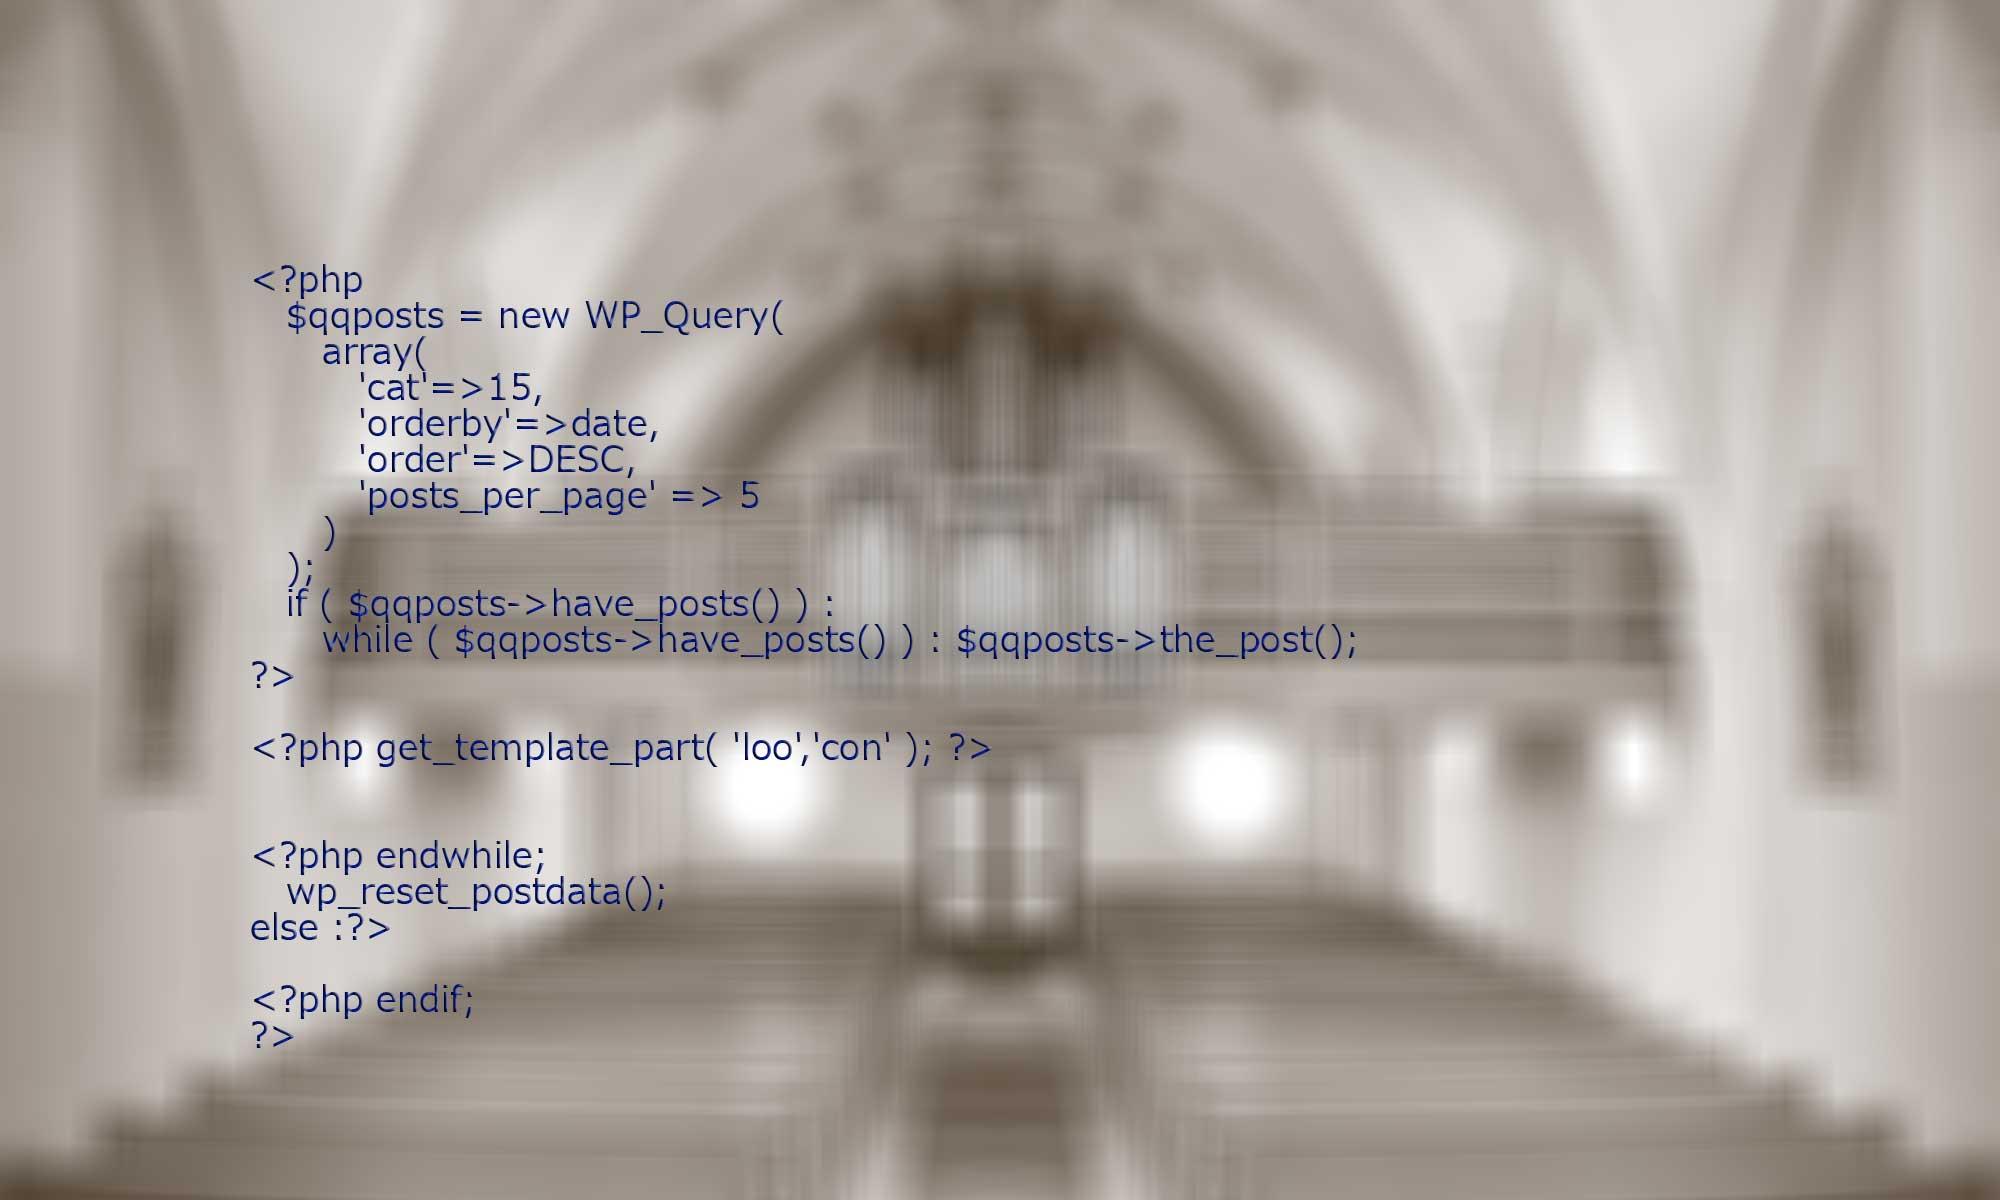 wp-queryをイメージした写真